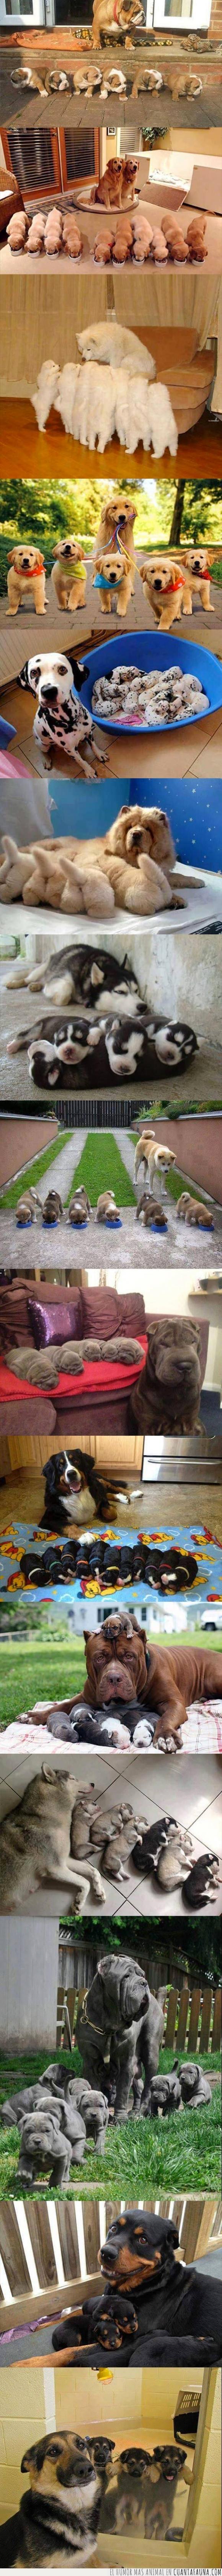 cachorro,camada,madre,orgullosa,perro